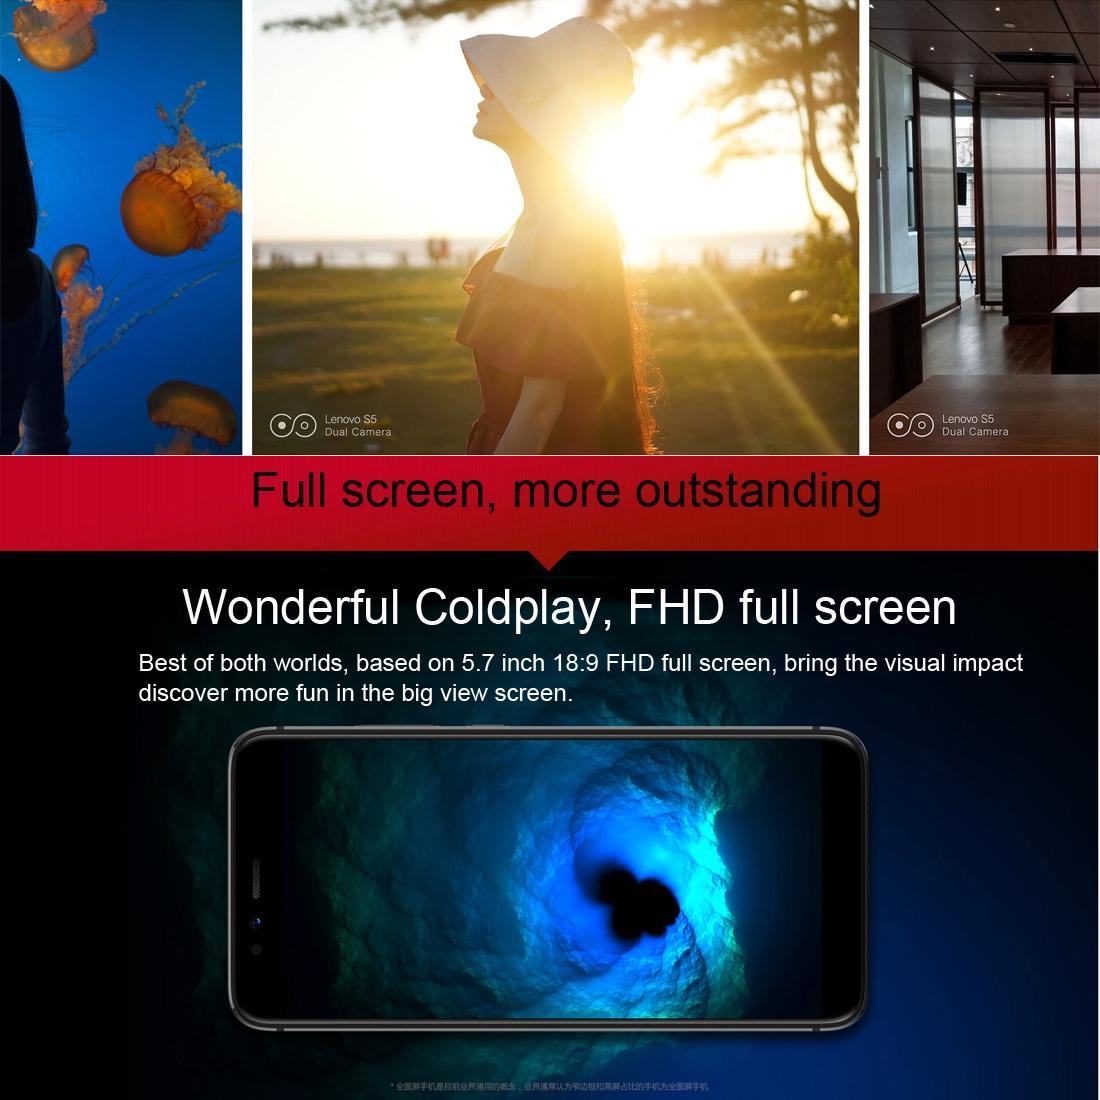 i.ibb.co/b2ddvp6/Smartphone-Celular-3-GB-RAM-32-GB-ROM-Lenovo-S5-K520-8.jpg